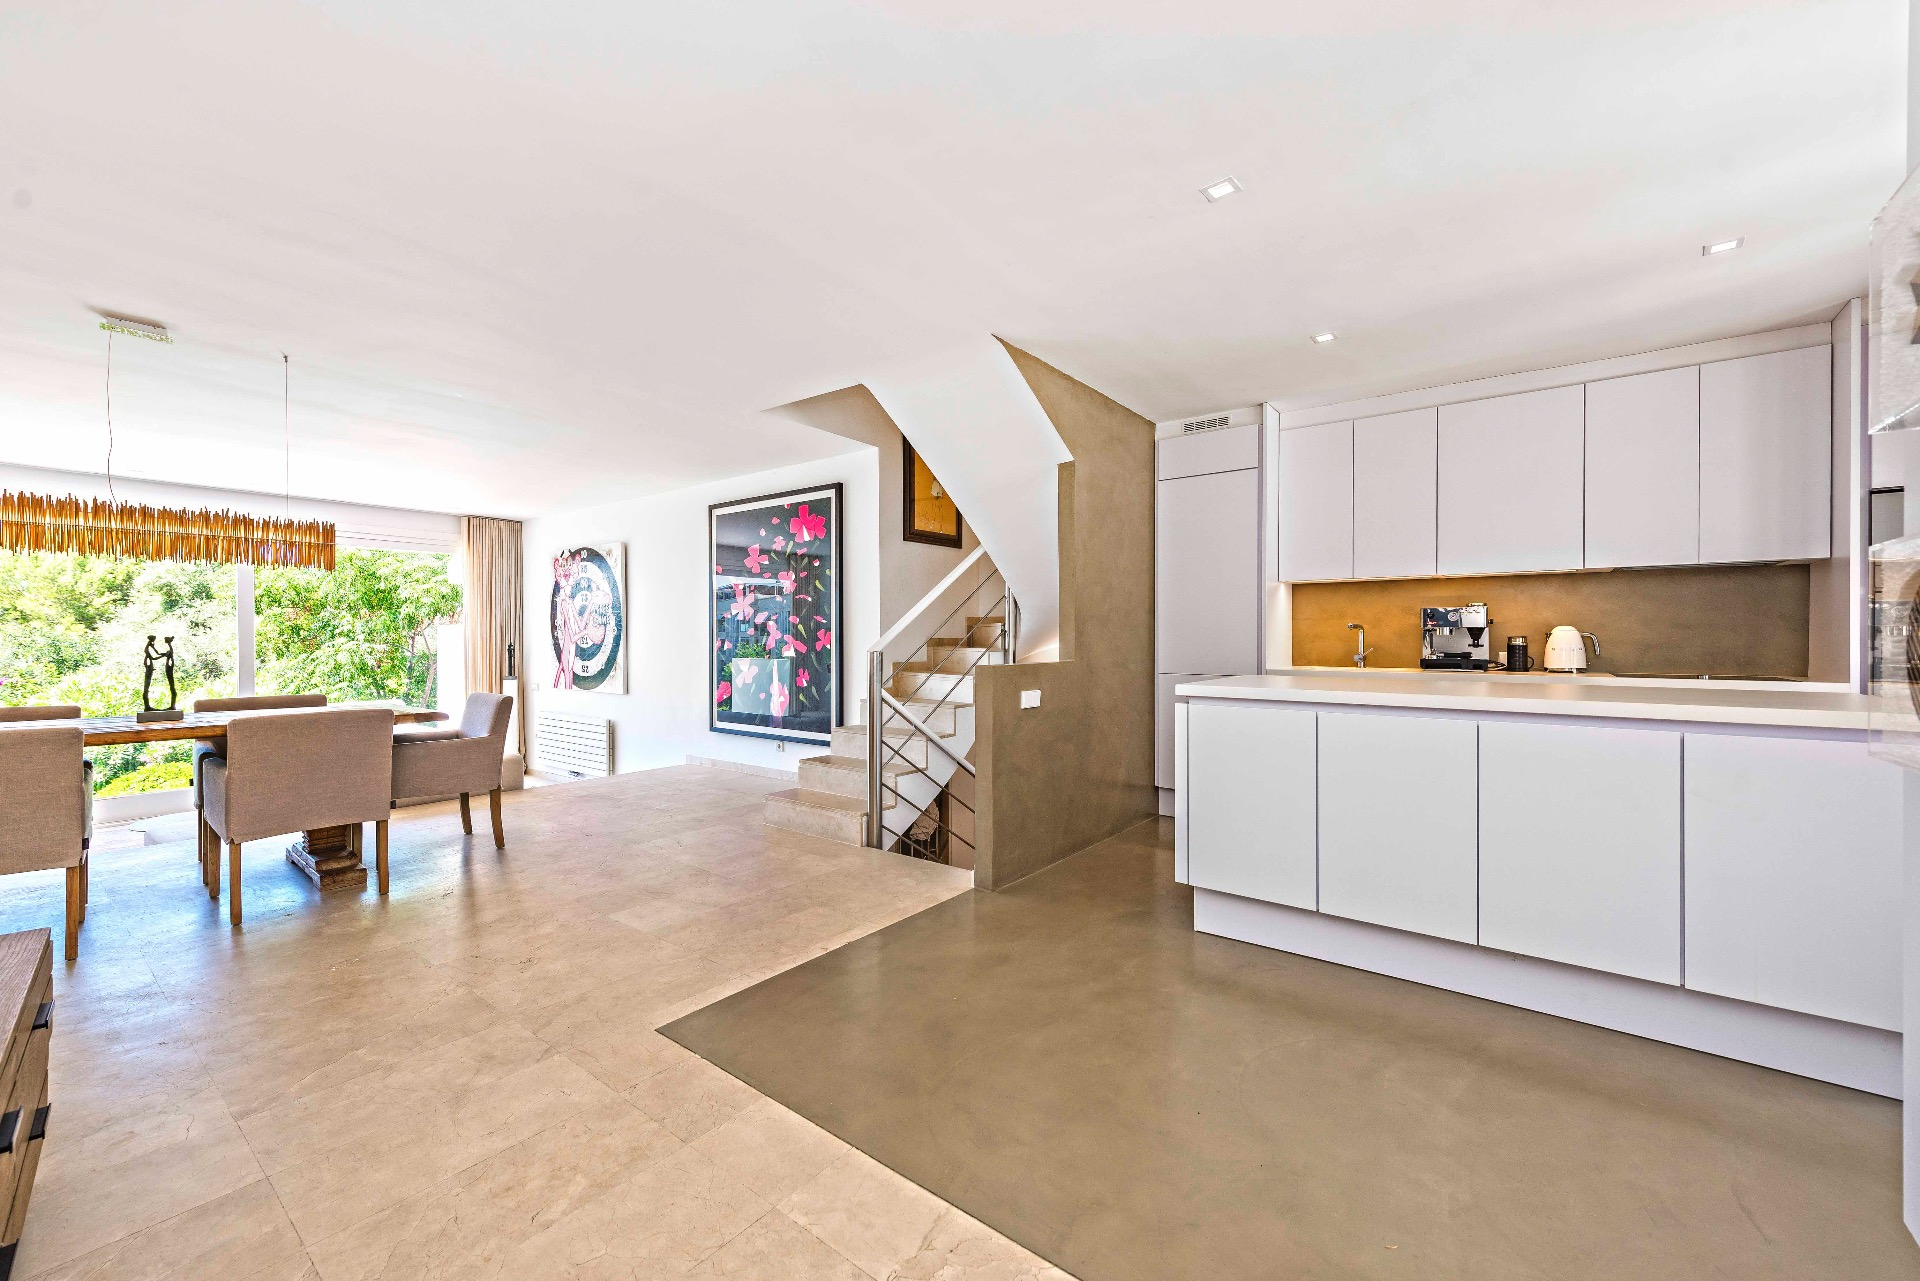 Bonanova: Modern semidetached townhouse with sea views. 4 bedrooms, 3 bathrooms, garage, communal pool, terraces. €795,000